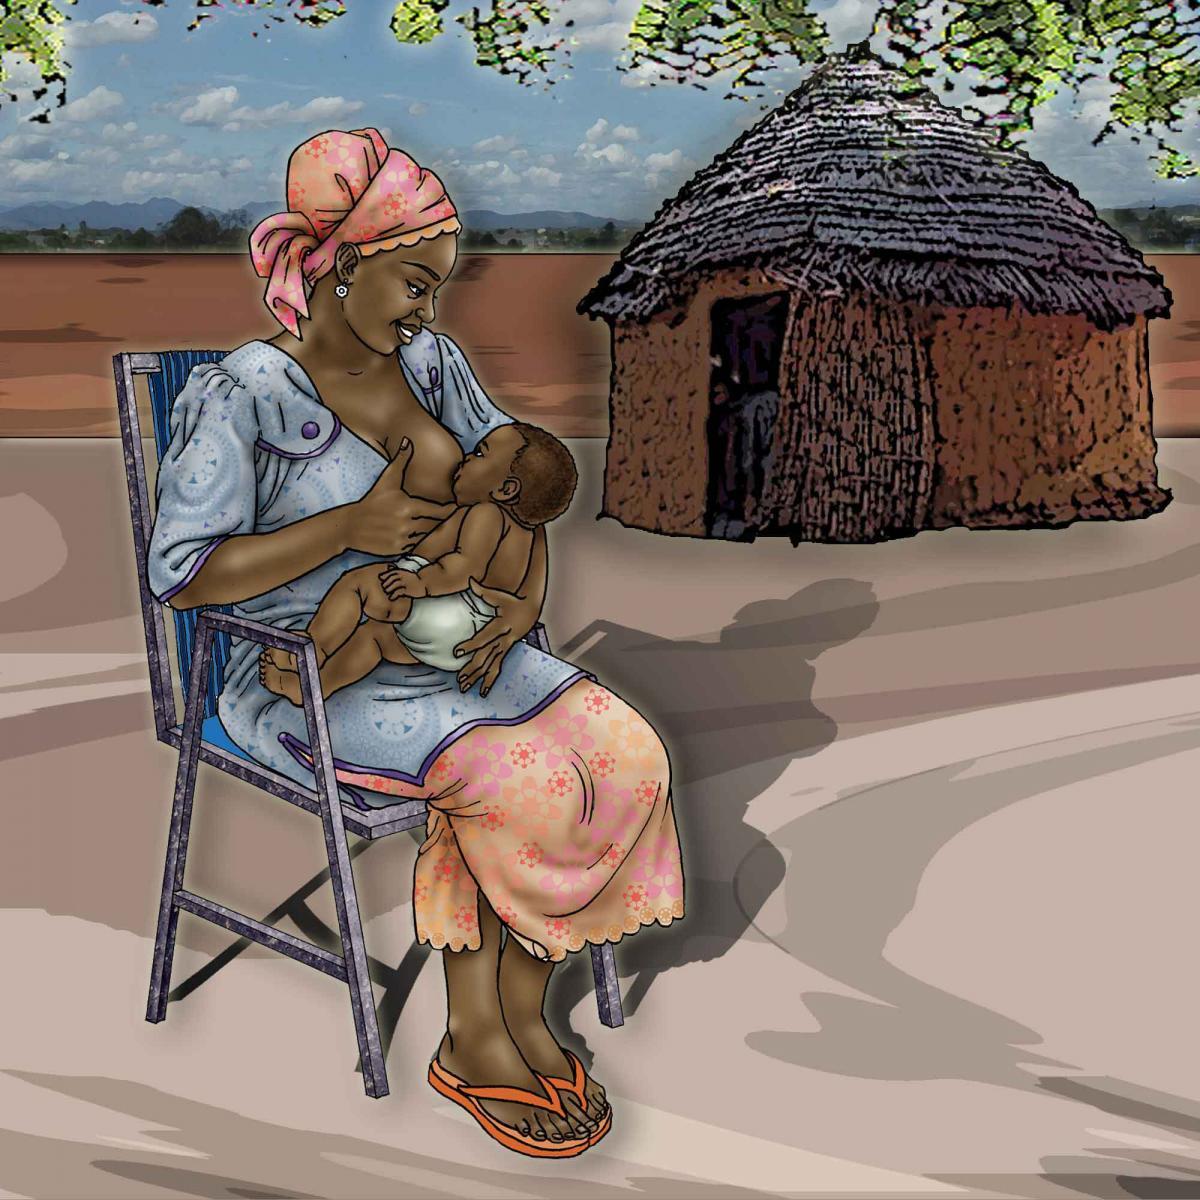 Breastfeeding - Exclusive breastfeeding - sitting - 00B - Uganda